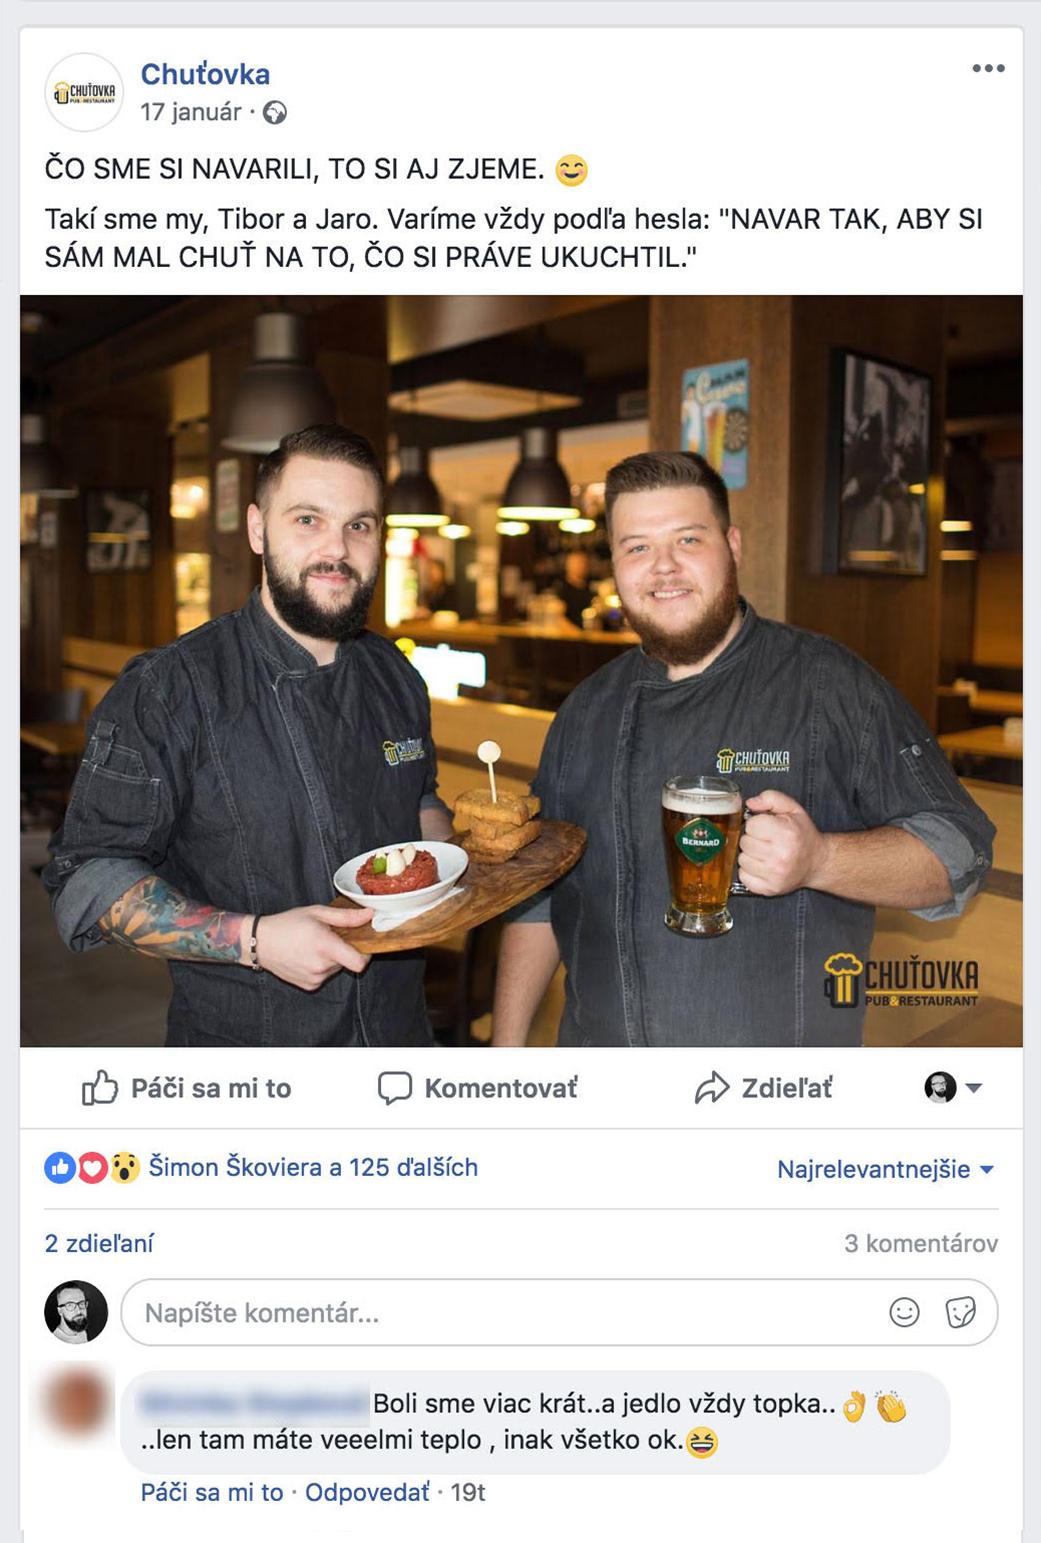 Autentik_sprava_socialnych_sieti